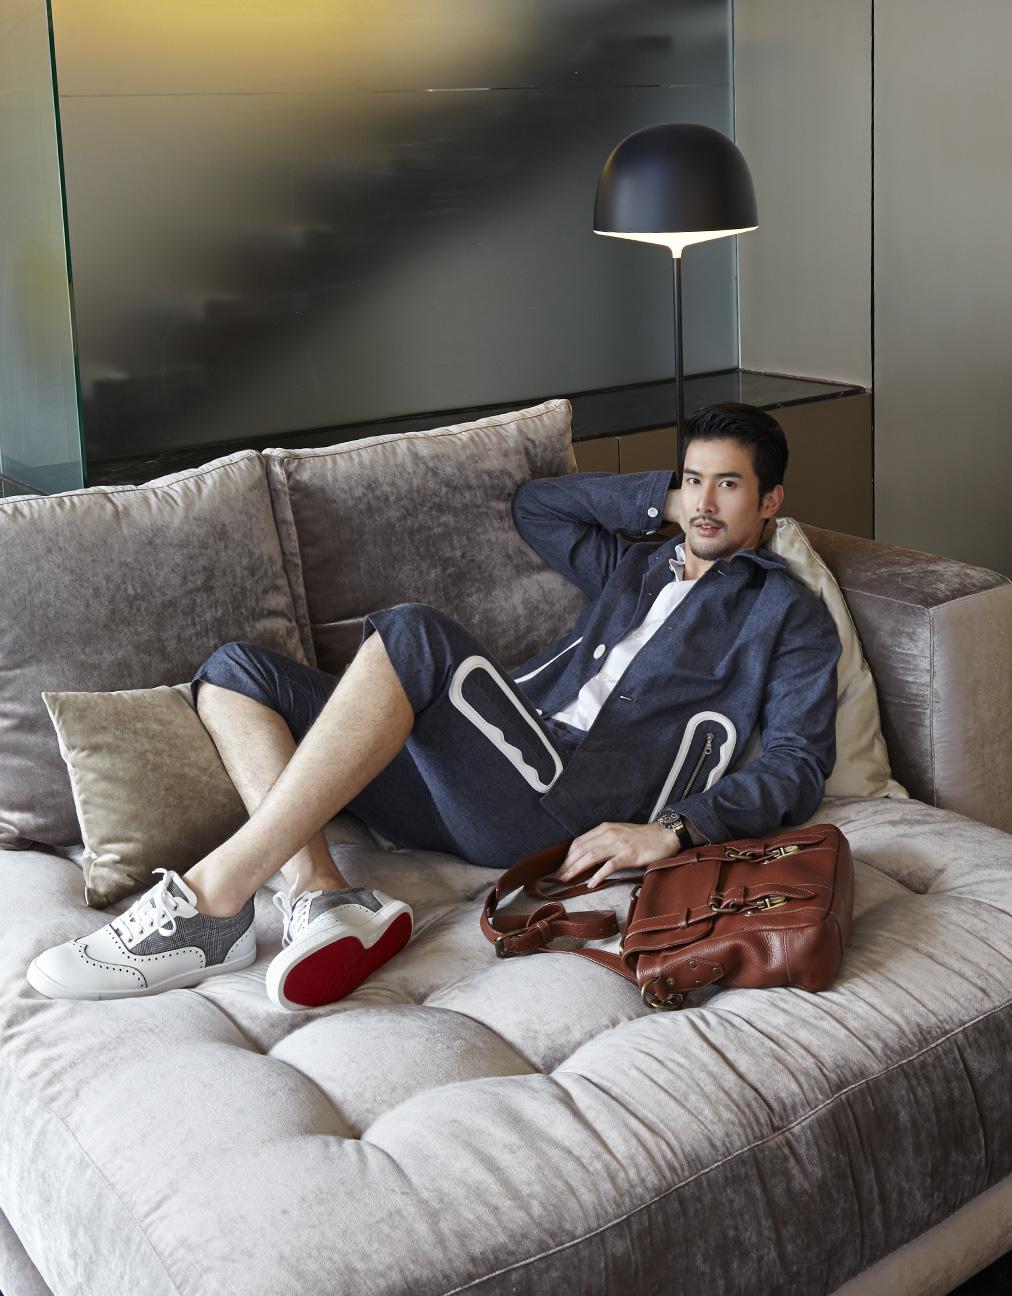 Model : Thee Wanichnunthatada @theetada Clothes : KENZO / Bag : TADA bag @tadabag  Shoes : Christian Louboutin Showroom : LIM 941 Sukhumvit 51 tel 0-2662-6376